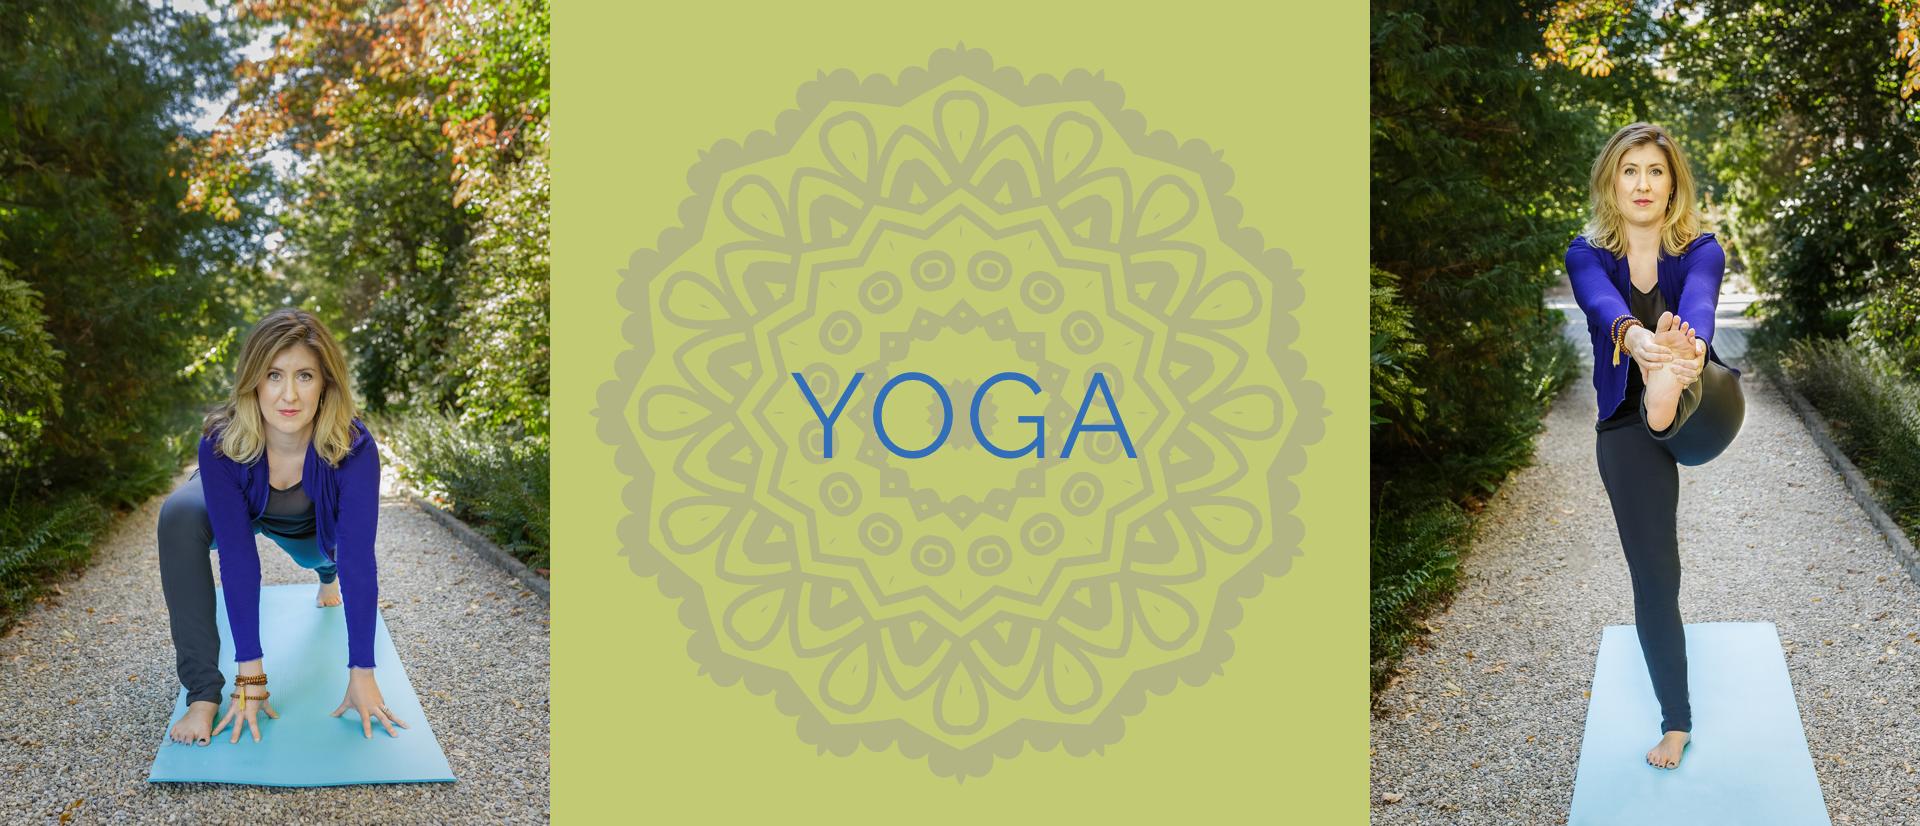 Slow Flow Yoga 4/25